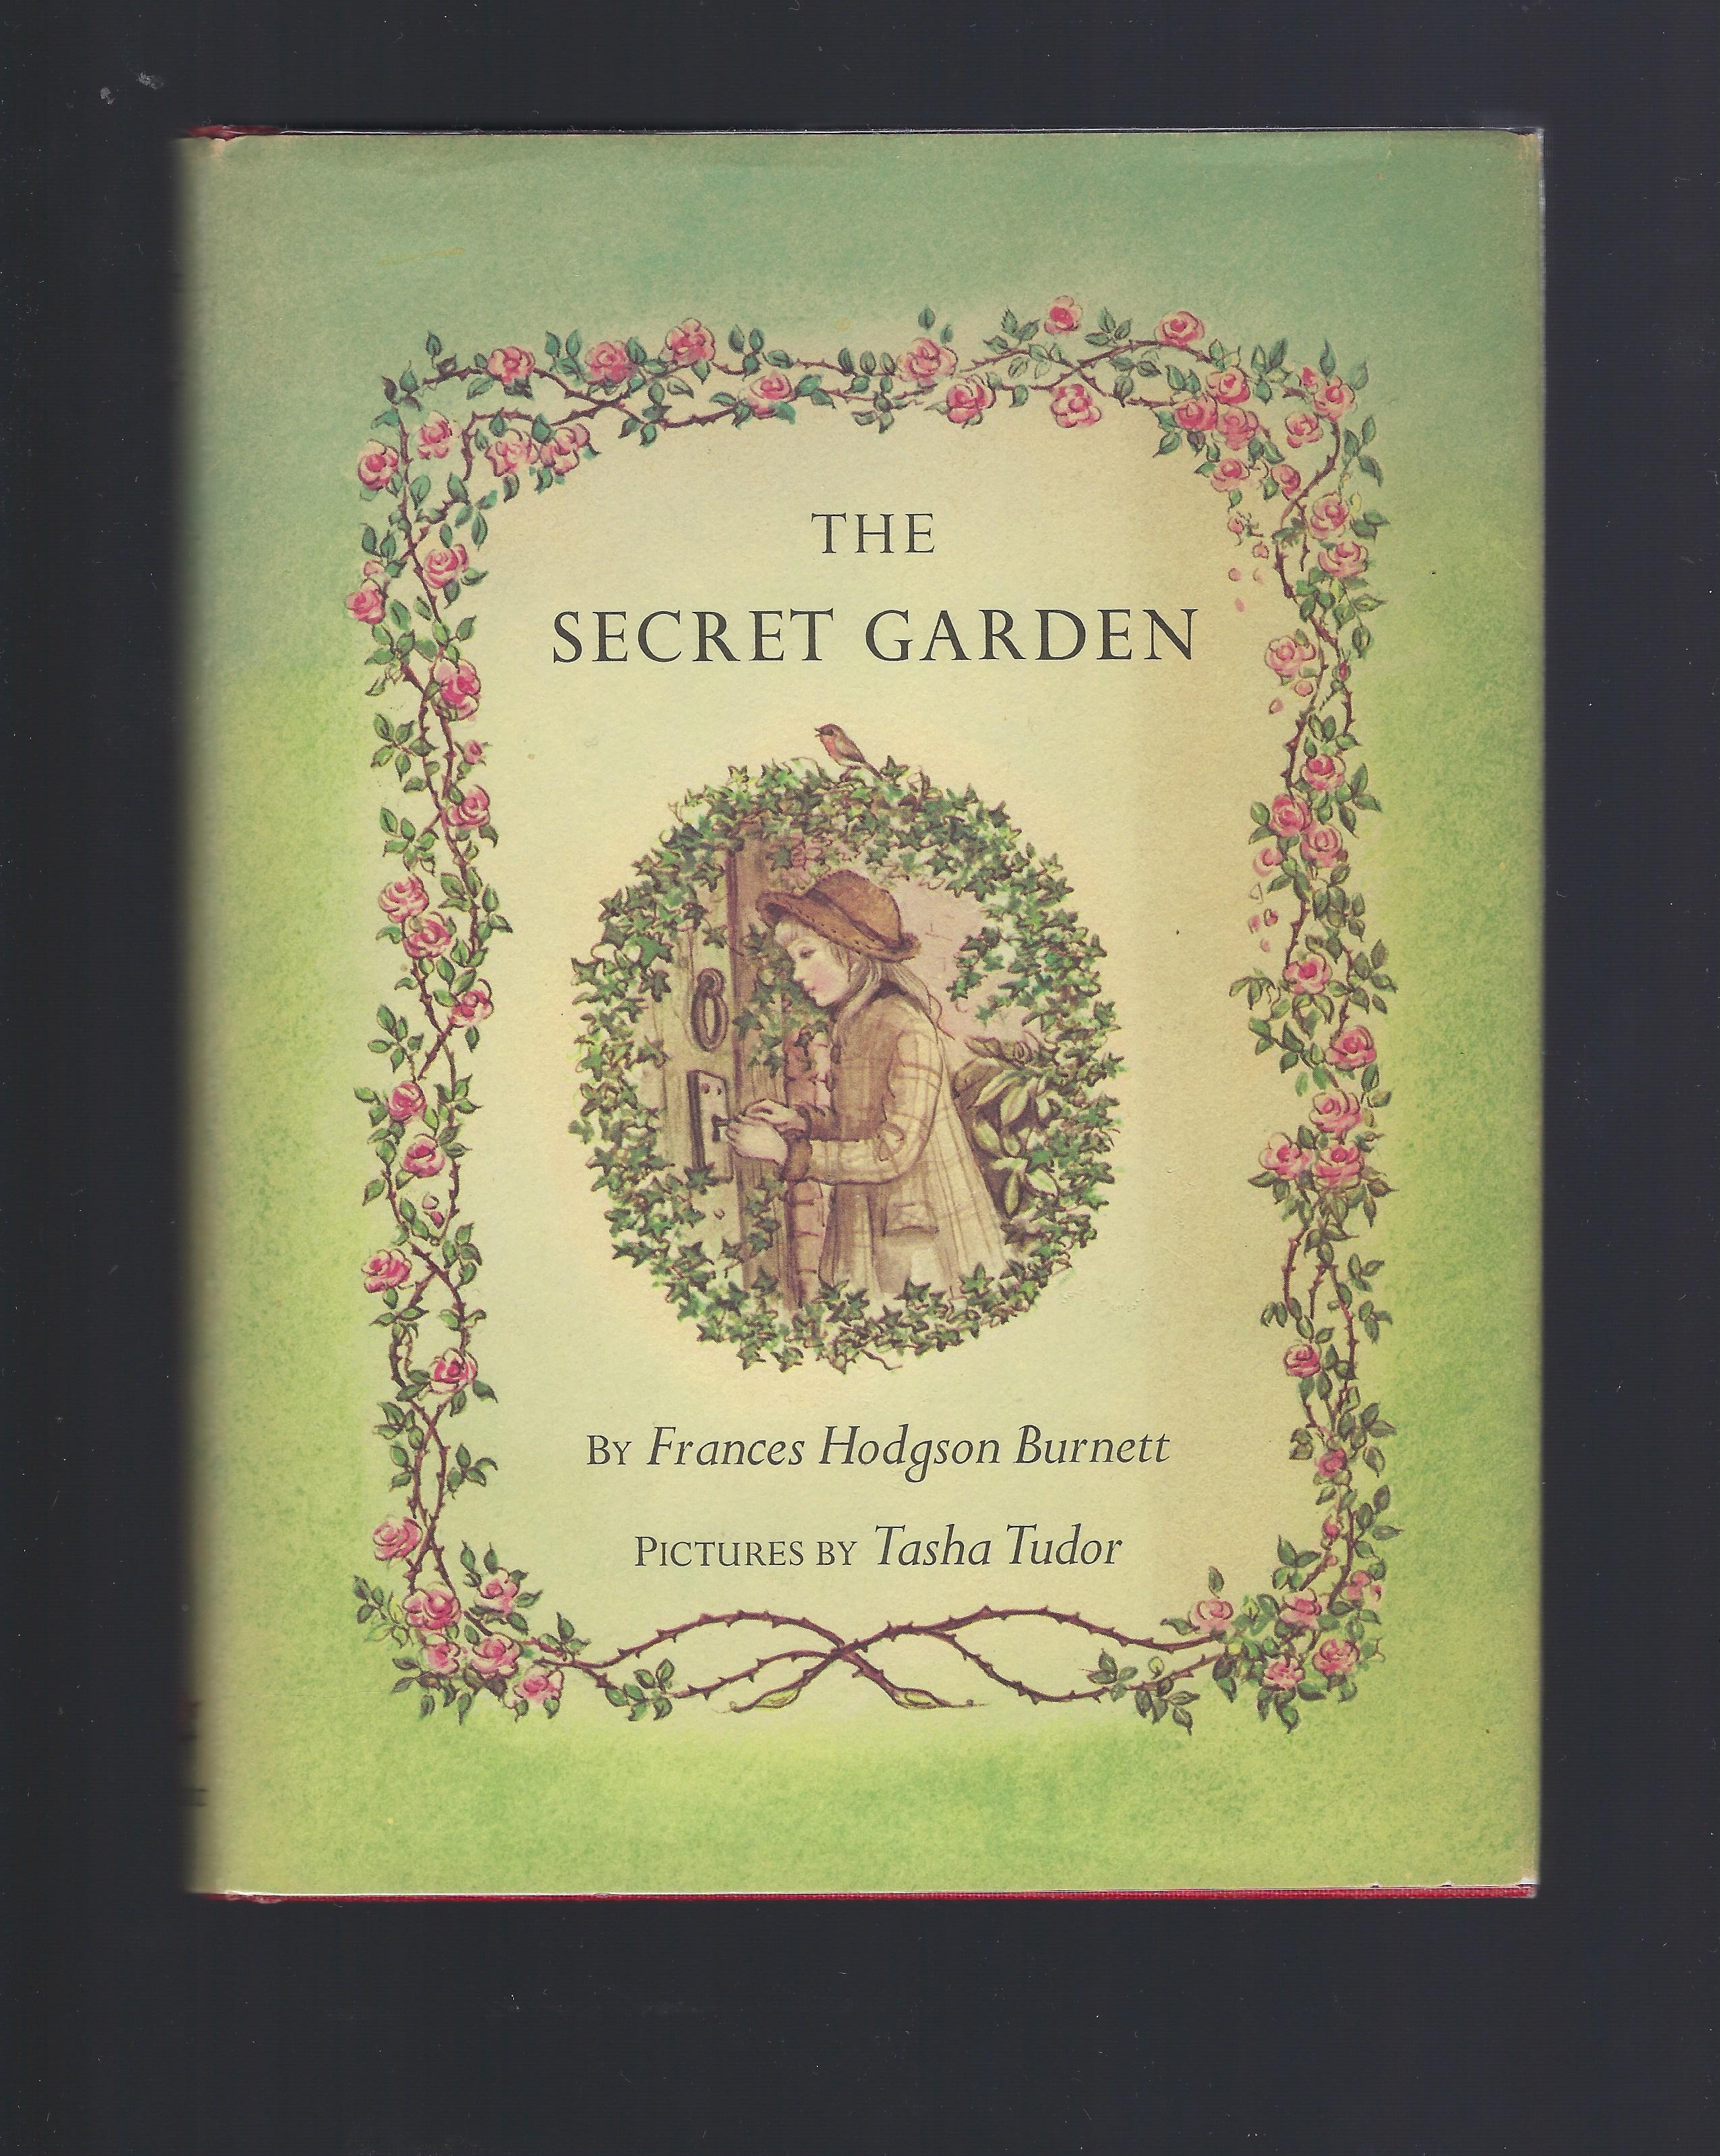 The Secret Garden (1980) illustrated by Tasha Tudor HB/DJ, Frances Hodgson Burnett; Illustrator-Tasha Tudor